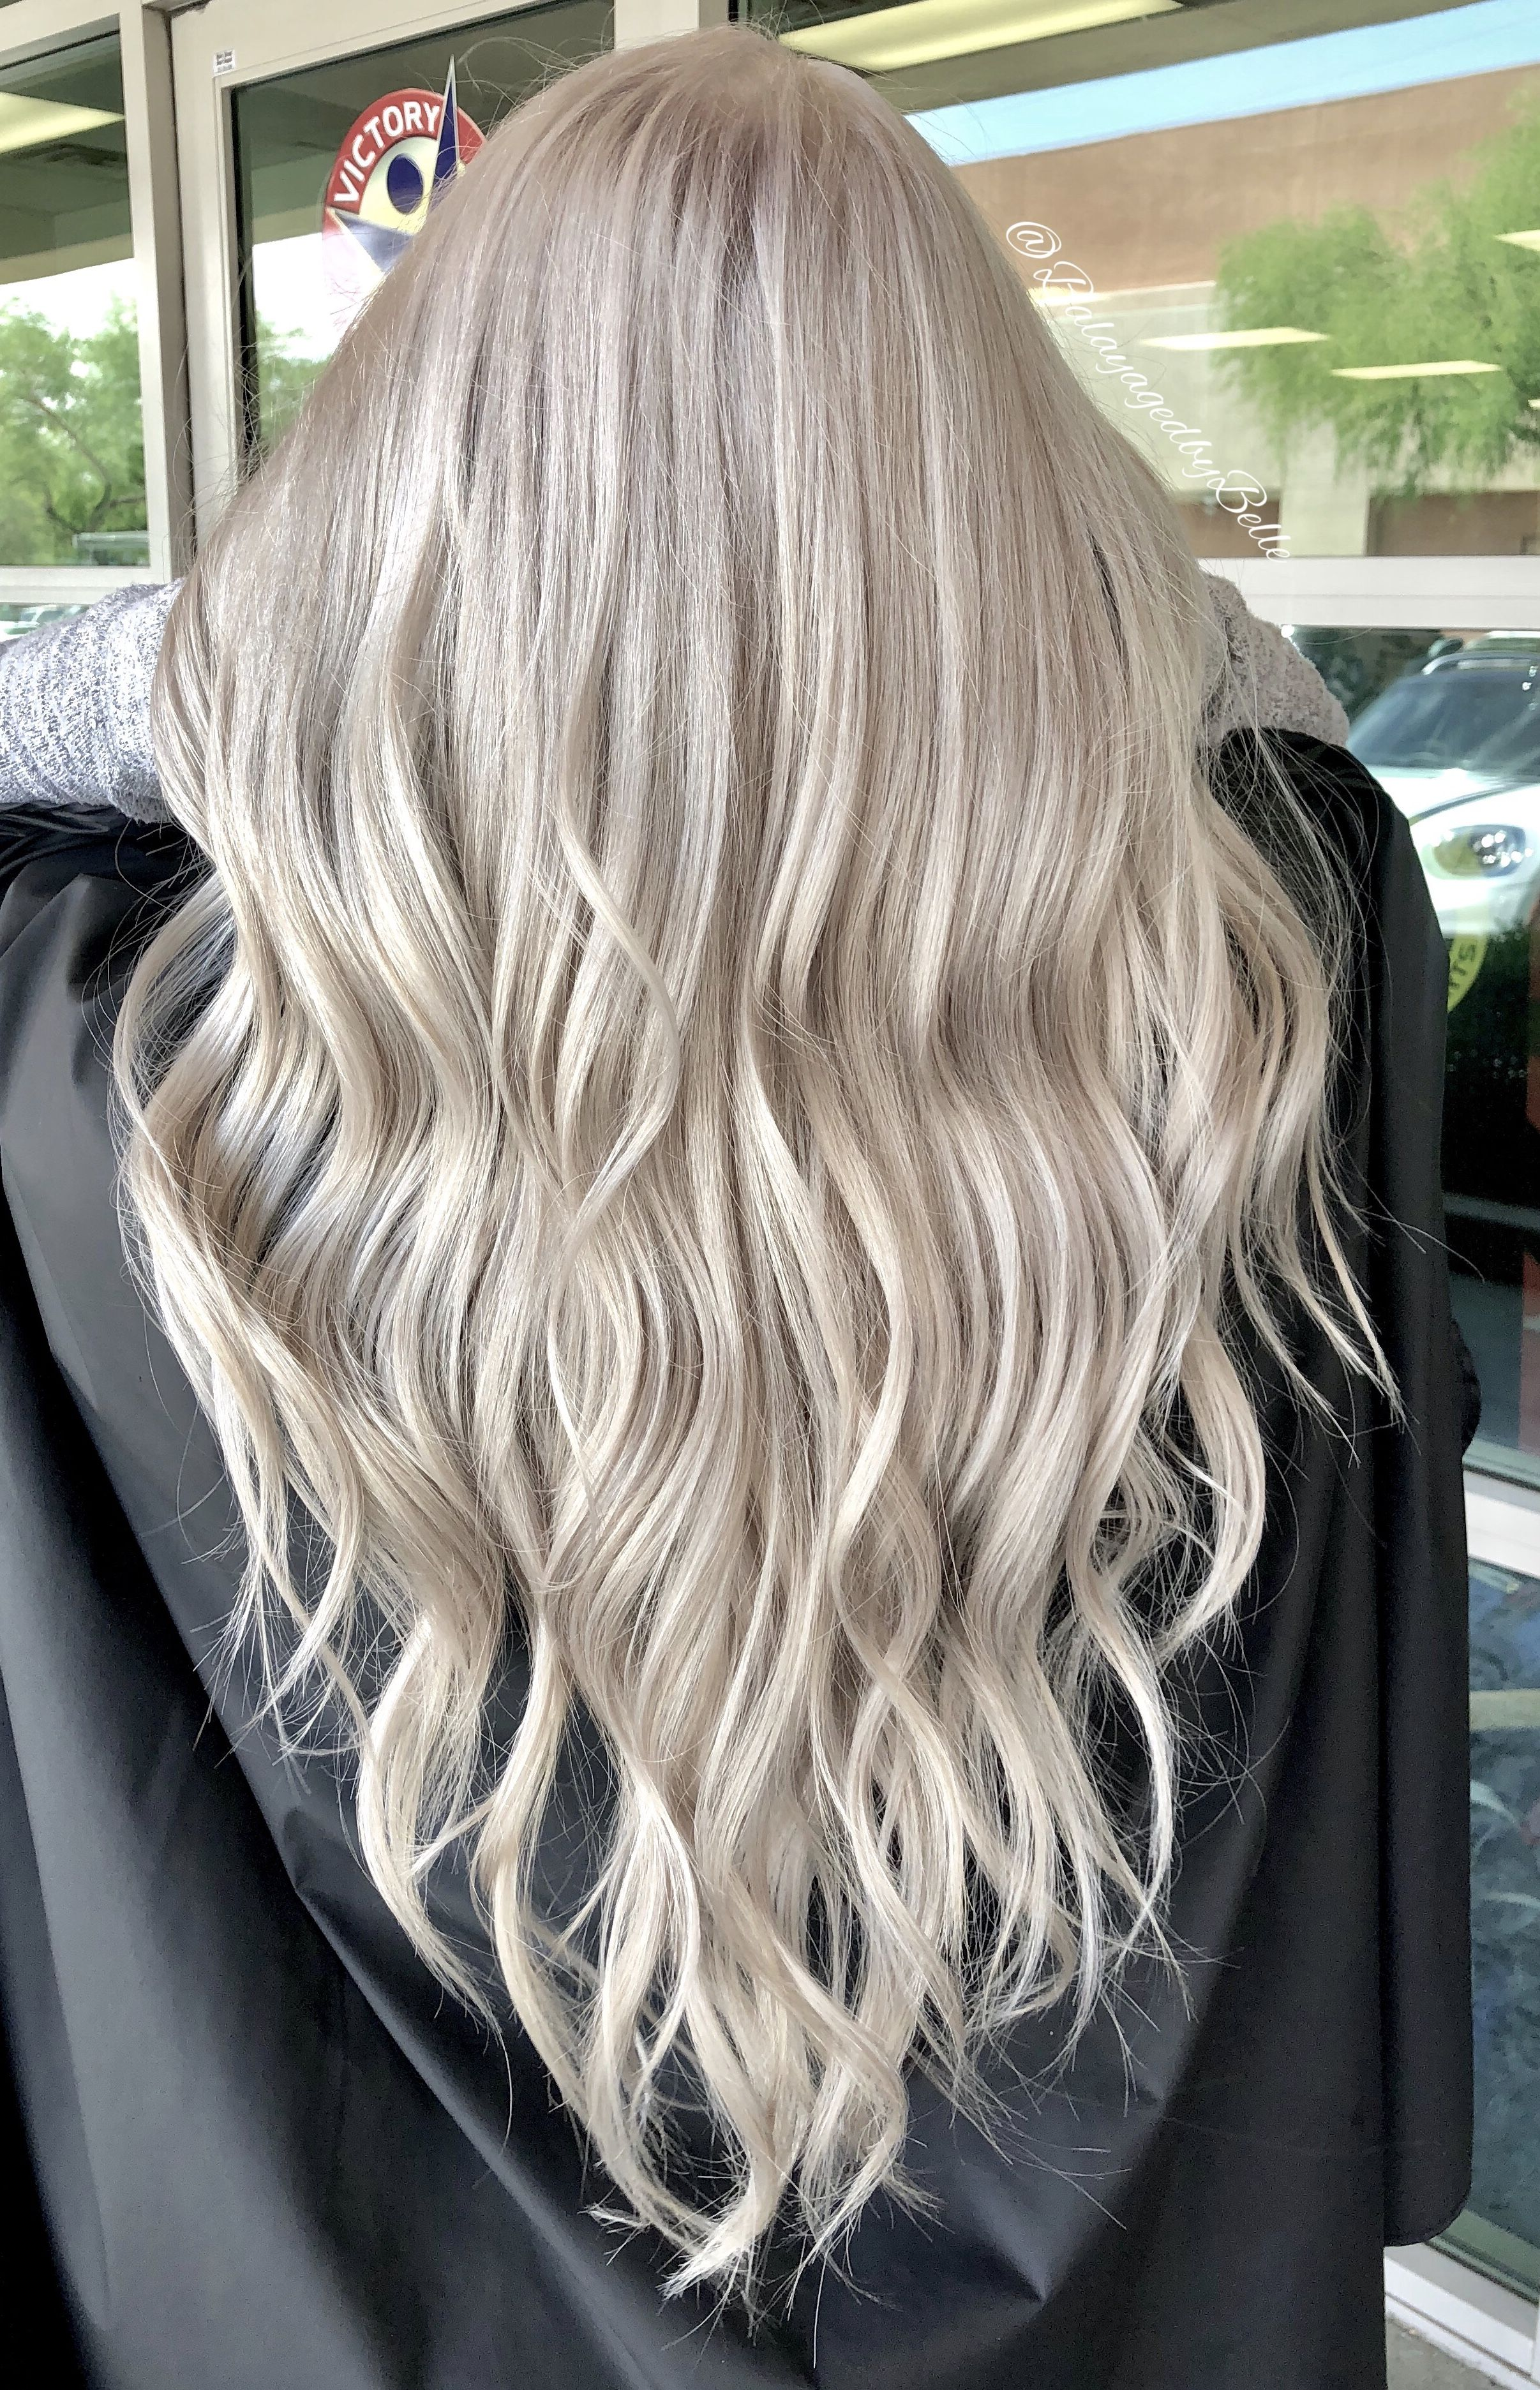 Platinum Blonde Icy Blonde Hair By Balyagedbybelle Icy Blonde Hair Silver Blonde Hair Icy Blonde